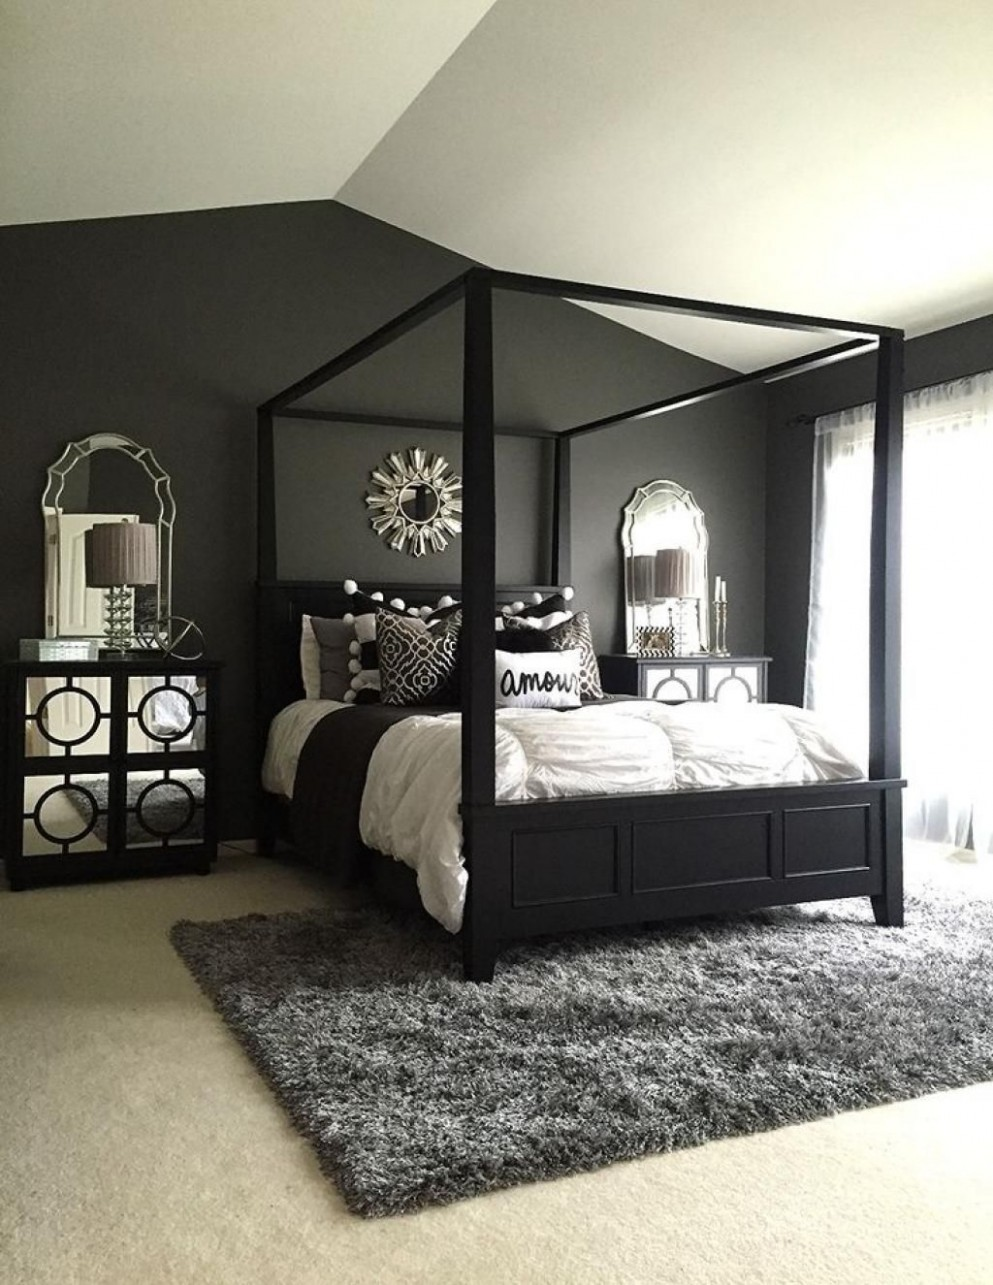 8 Elegant Black Bedroom Decorating Ideas  Black master bedroom  - Bedroom Ideas Black